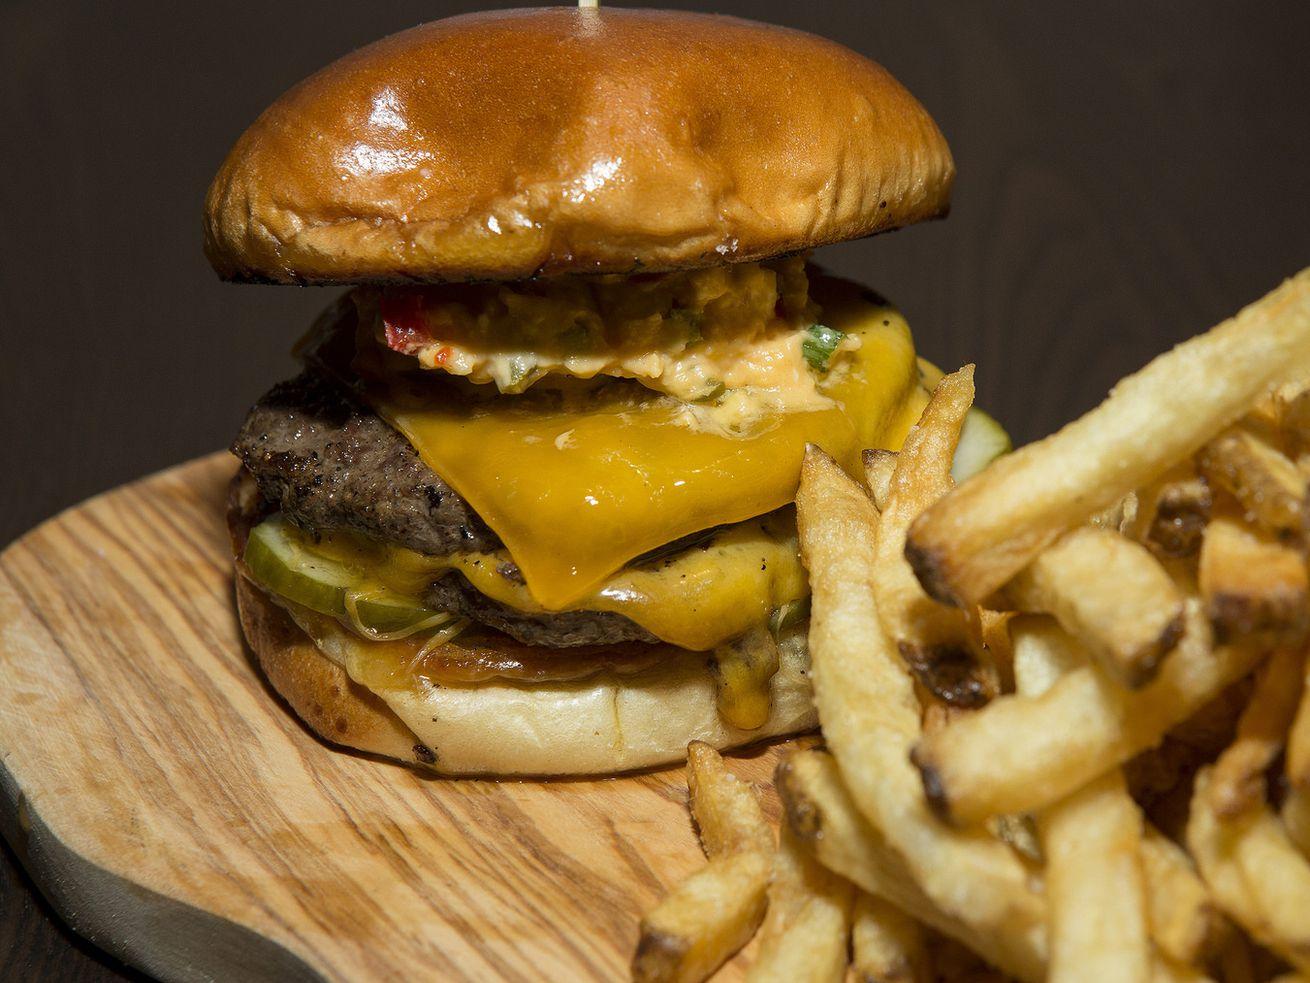 The Swill Inn's burger